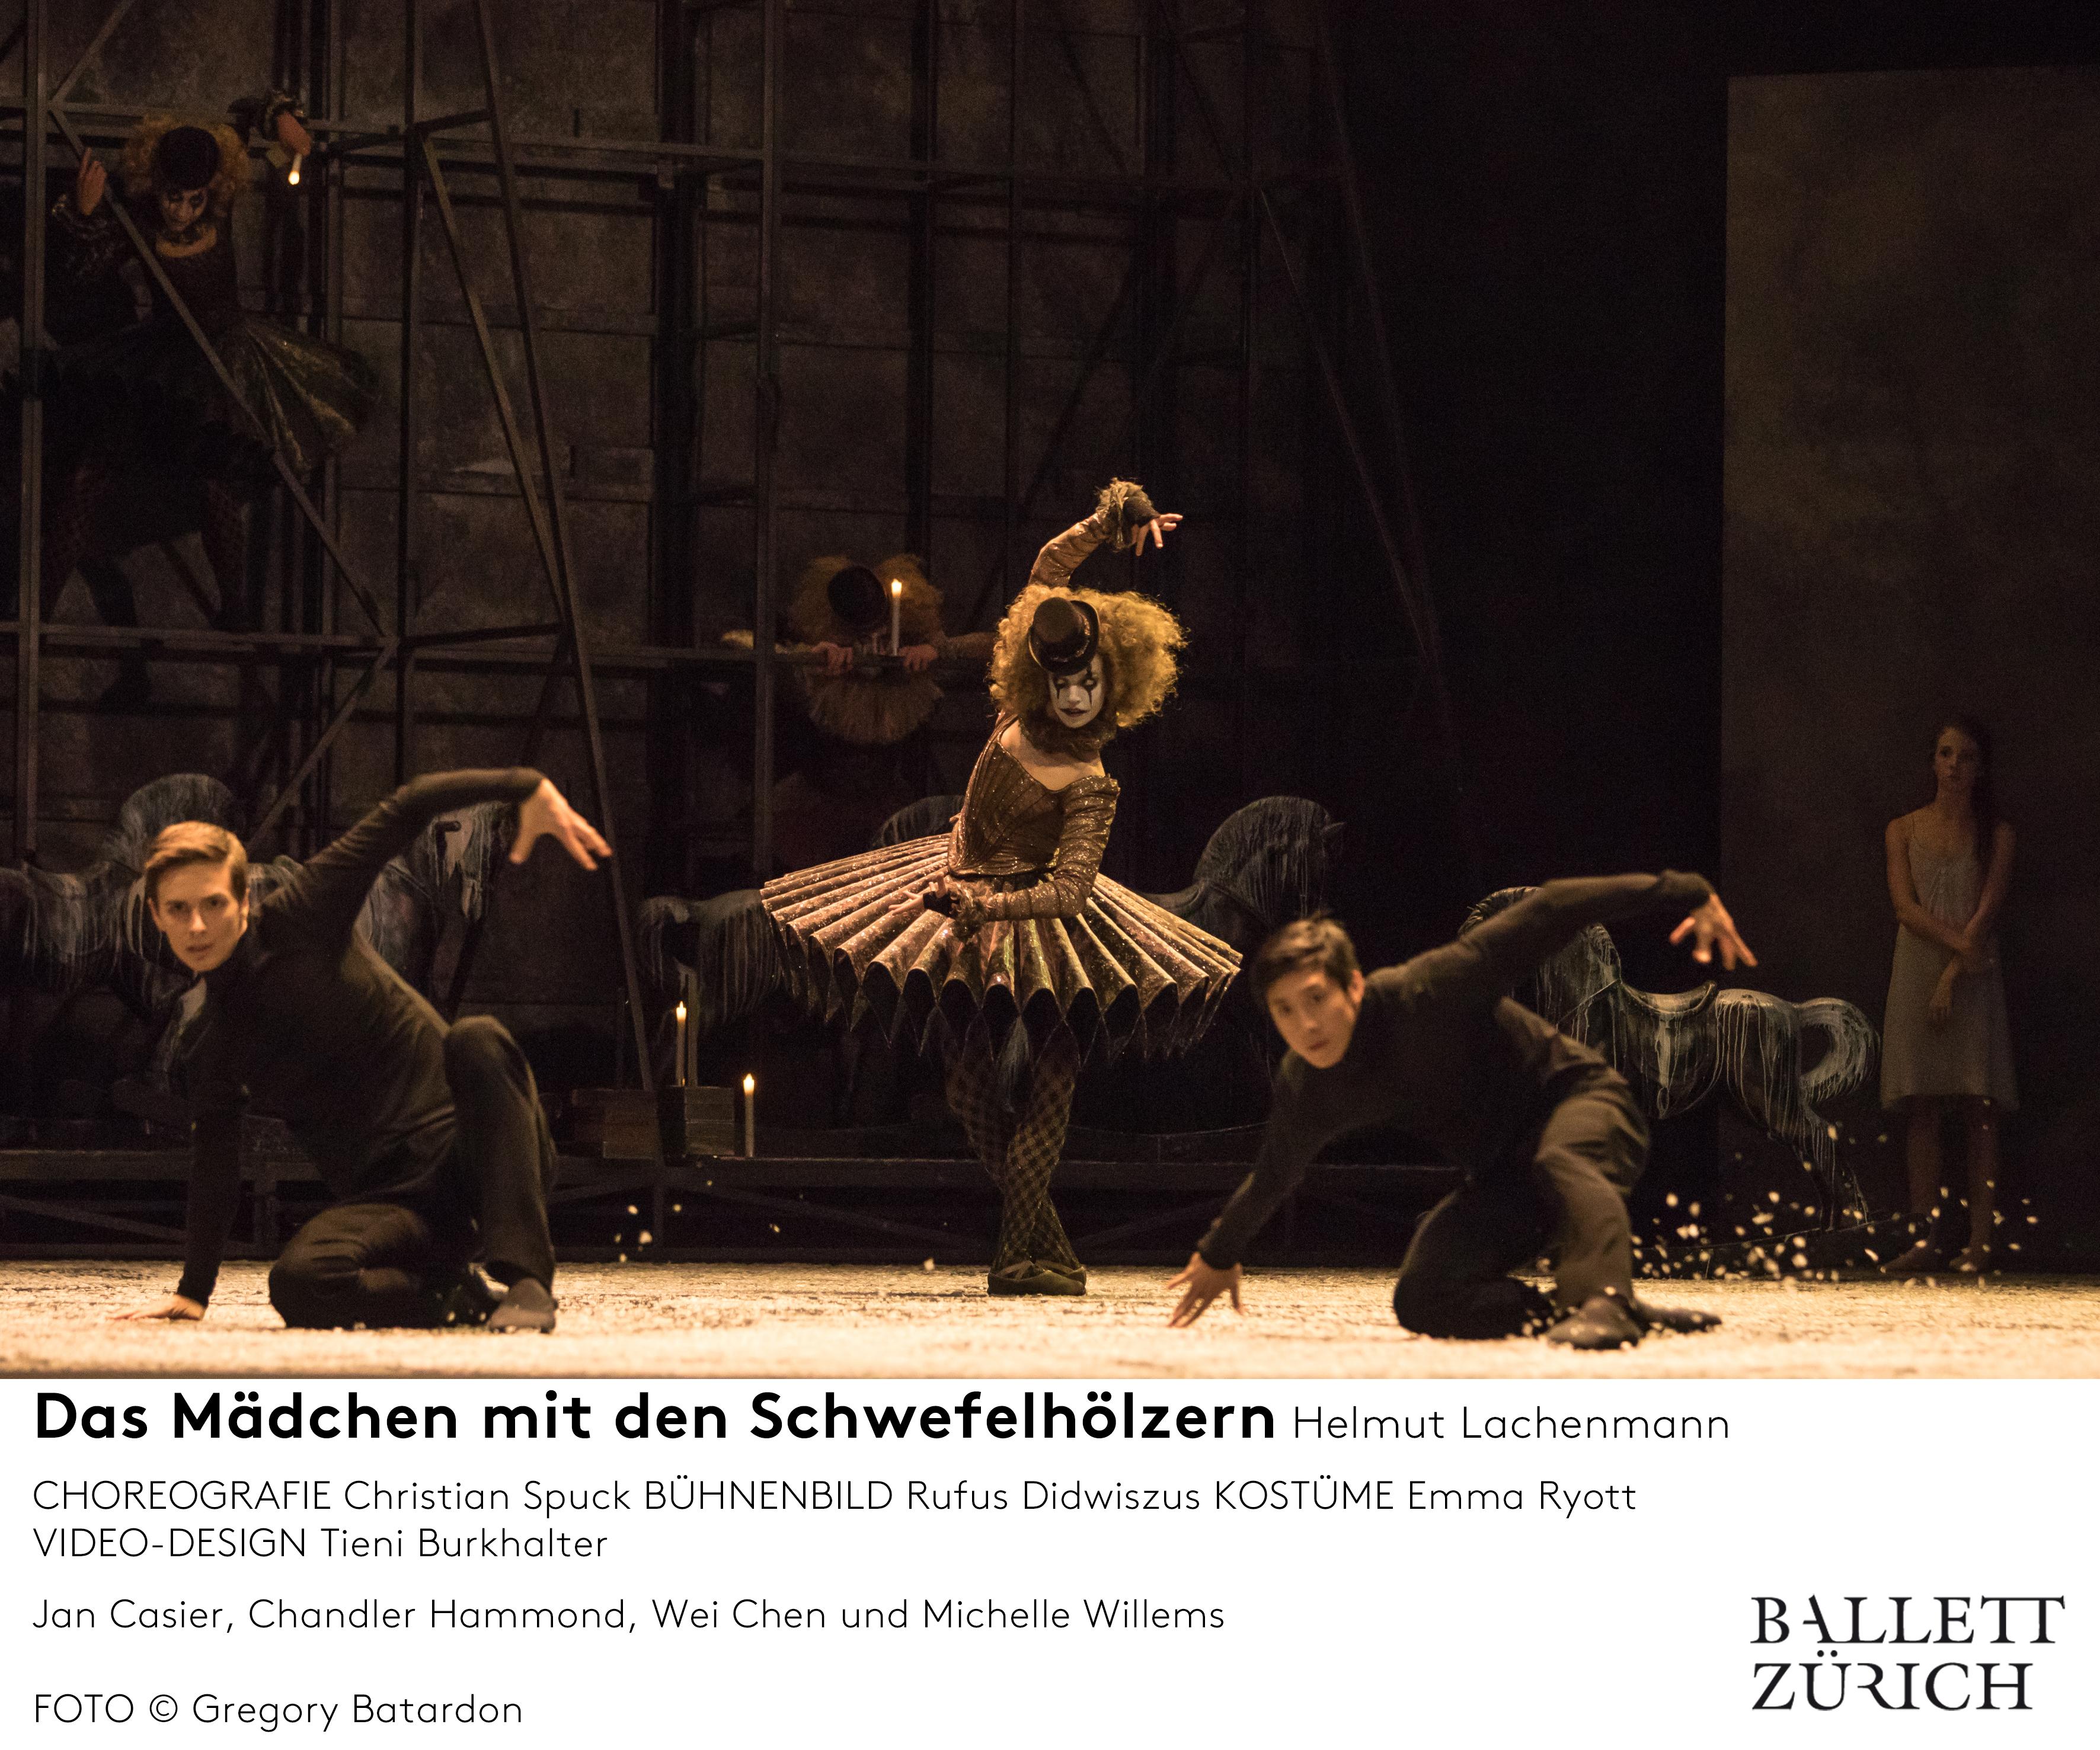 BALLETTMÄRCHEN DER GRAUSAMEN ART – balletloversblog